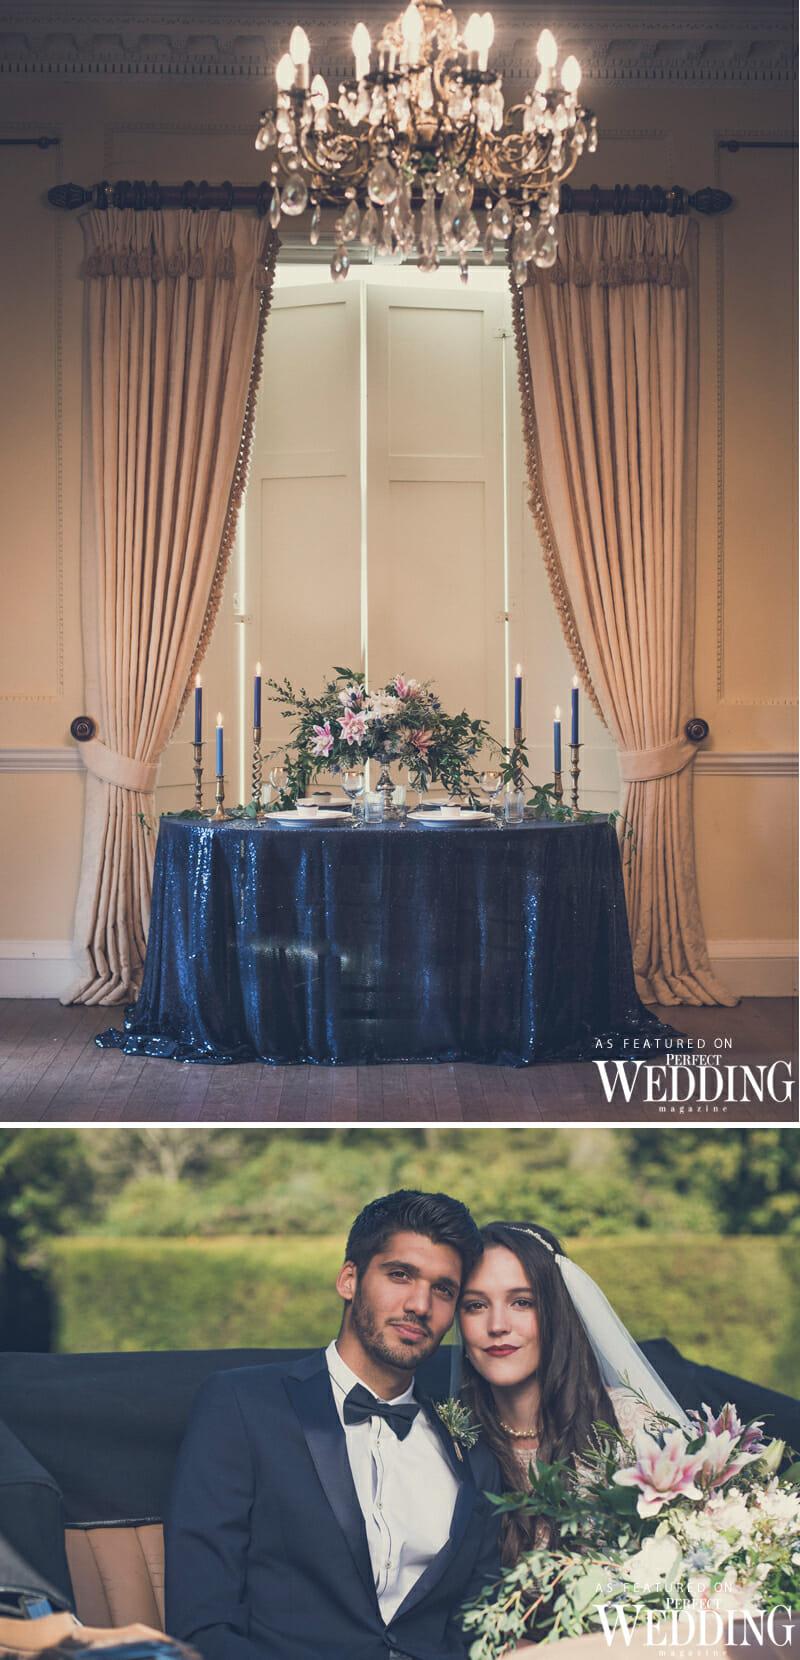 Vintage Wedding Theme, Wedding Decor, UK Wedding, Sprivers Mansion, Vintage Wedding, Perfect Wedding Magazine, Perfect Wedding Blog, Wedding Flowers, Wedding Cake